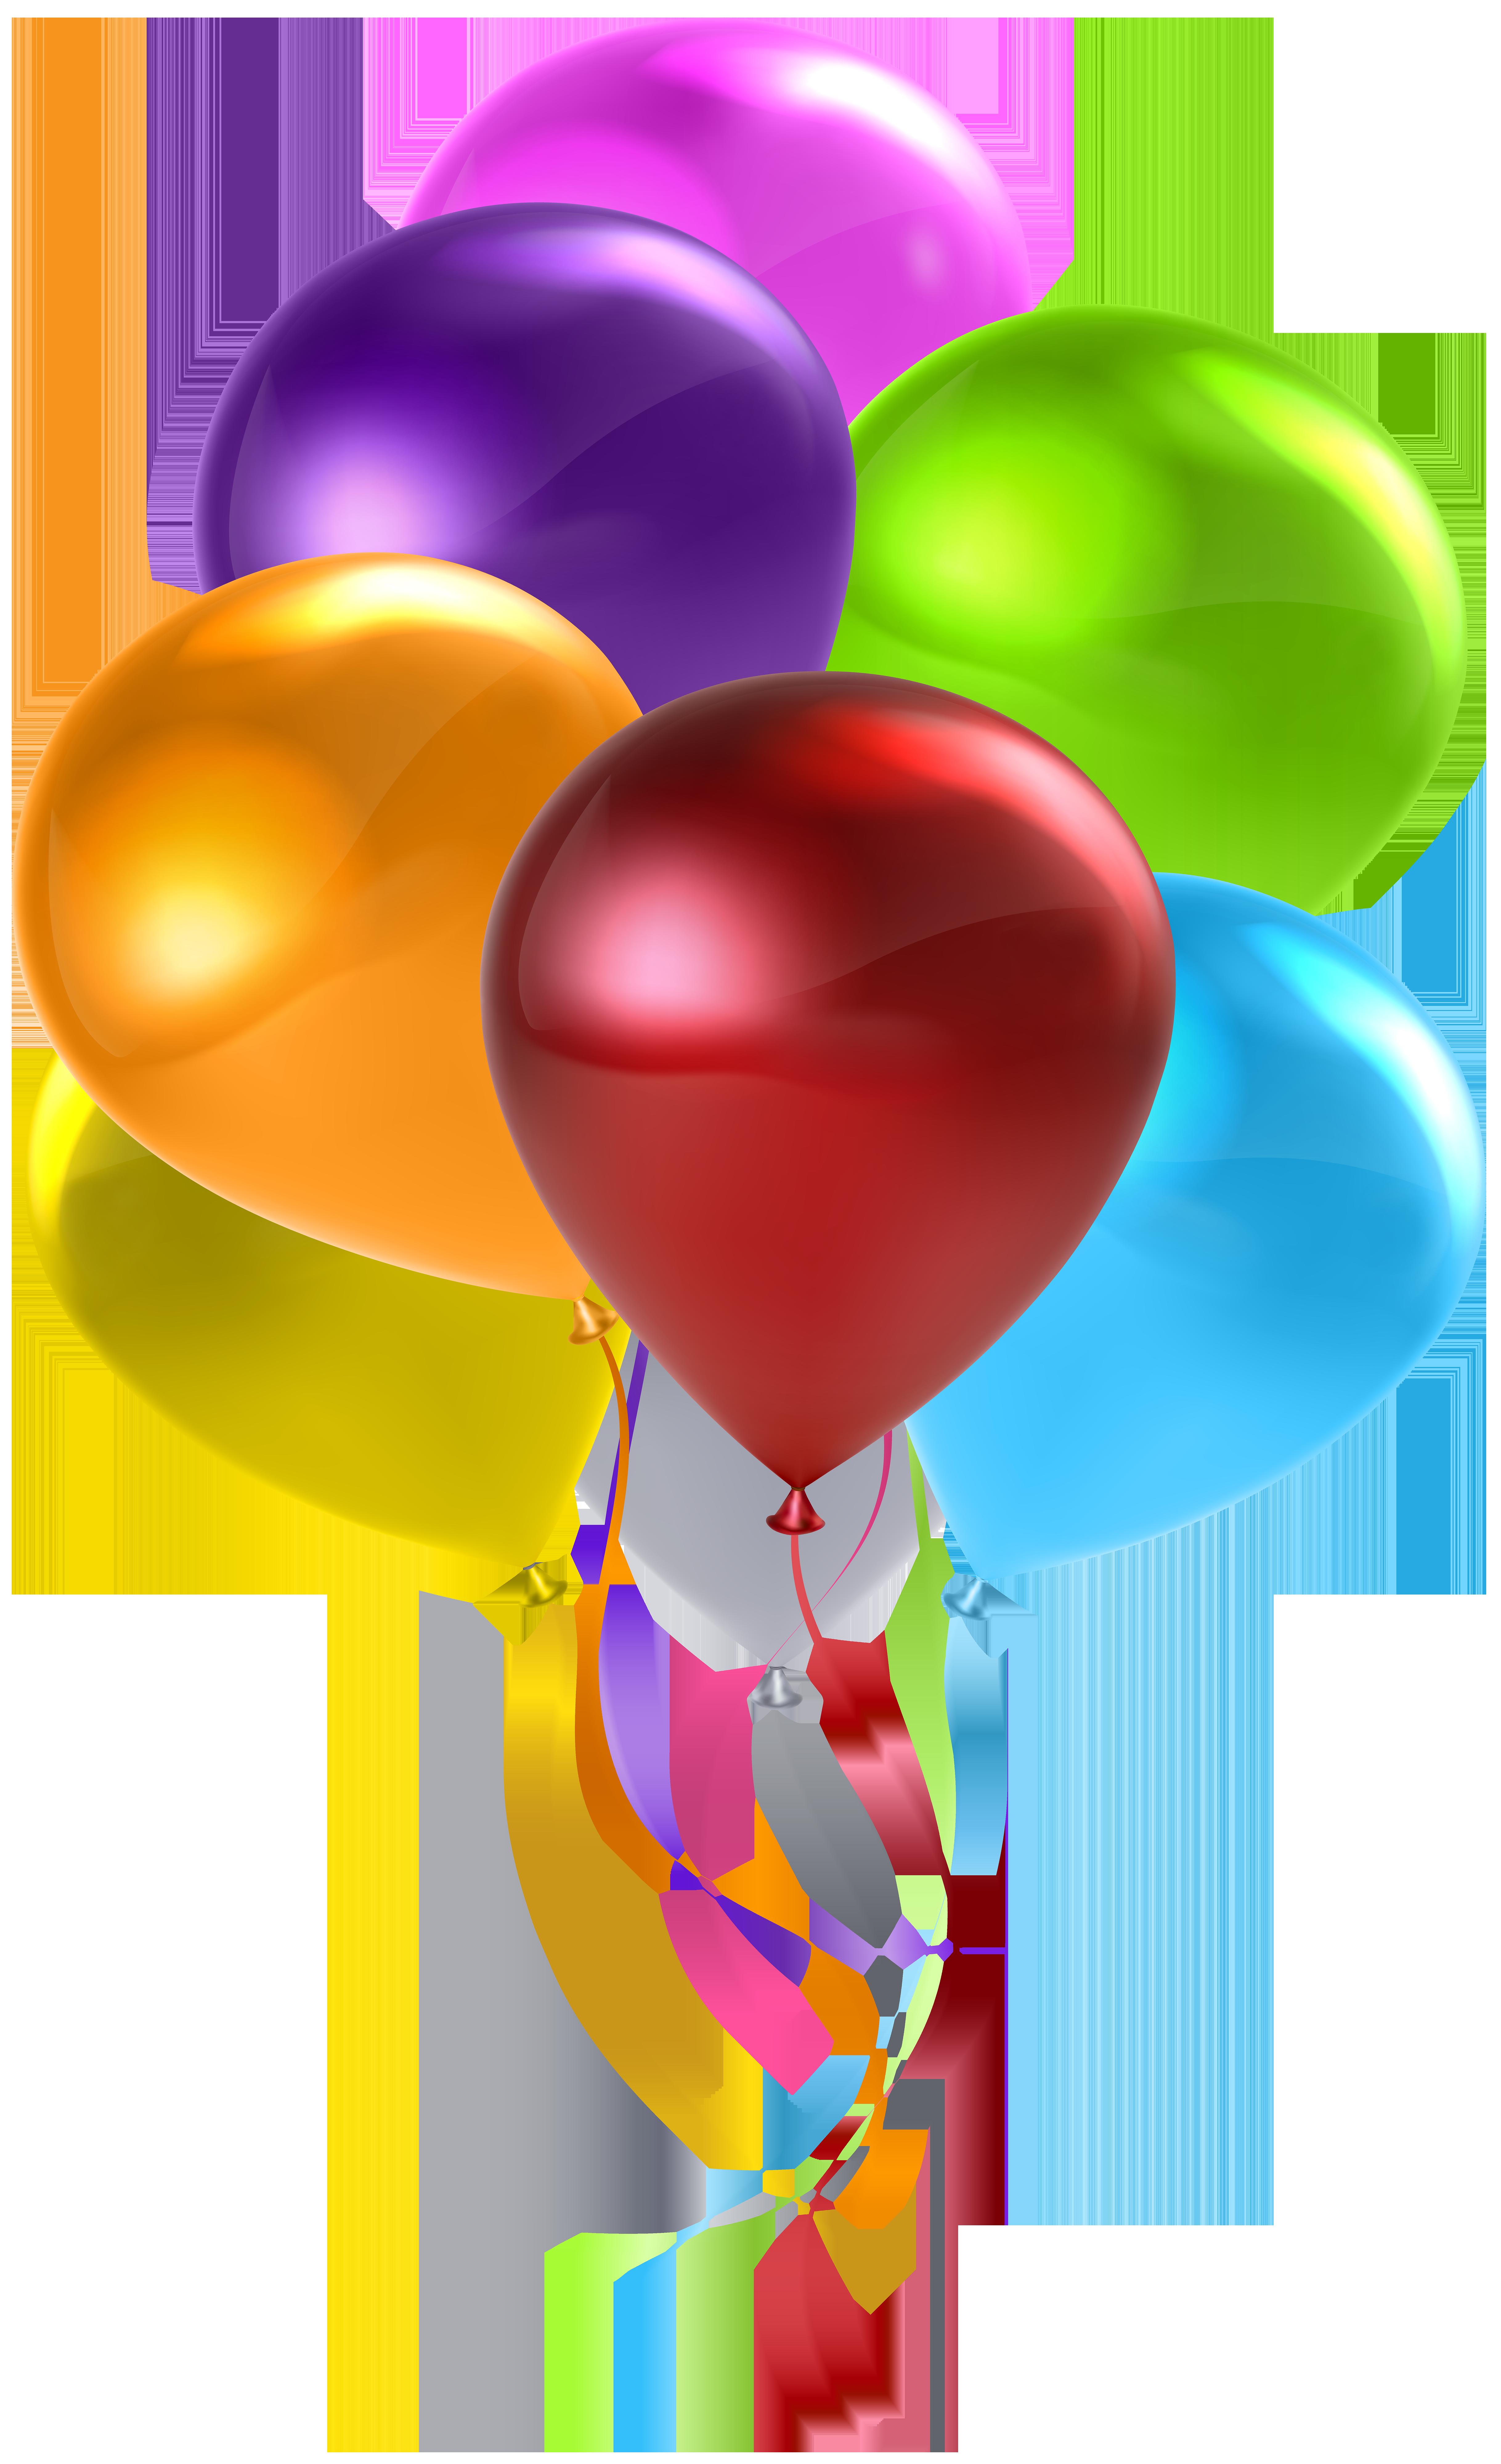 Maracas clipart clip art. Colorful balloon bunch transparent